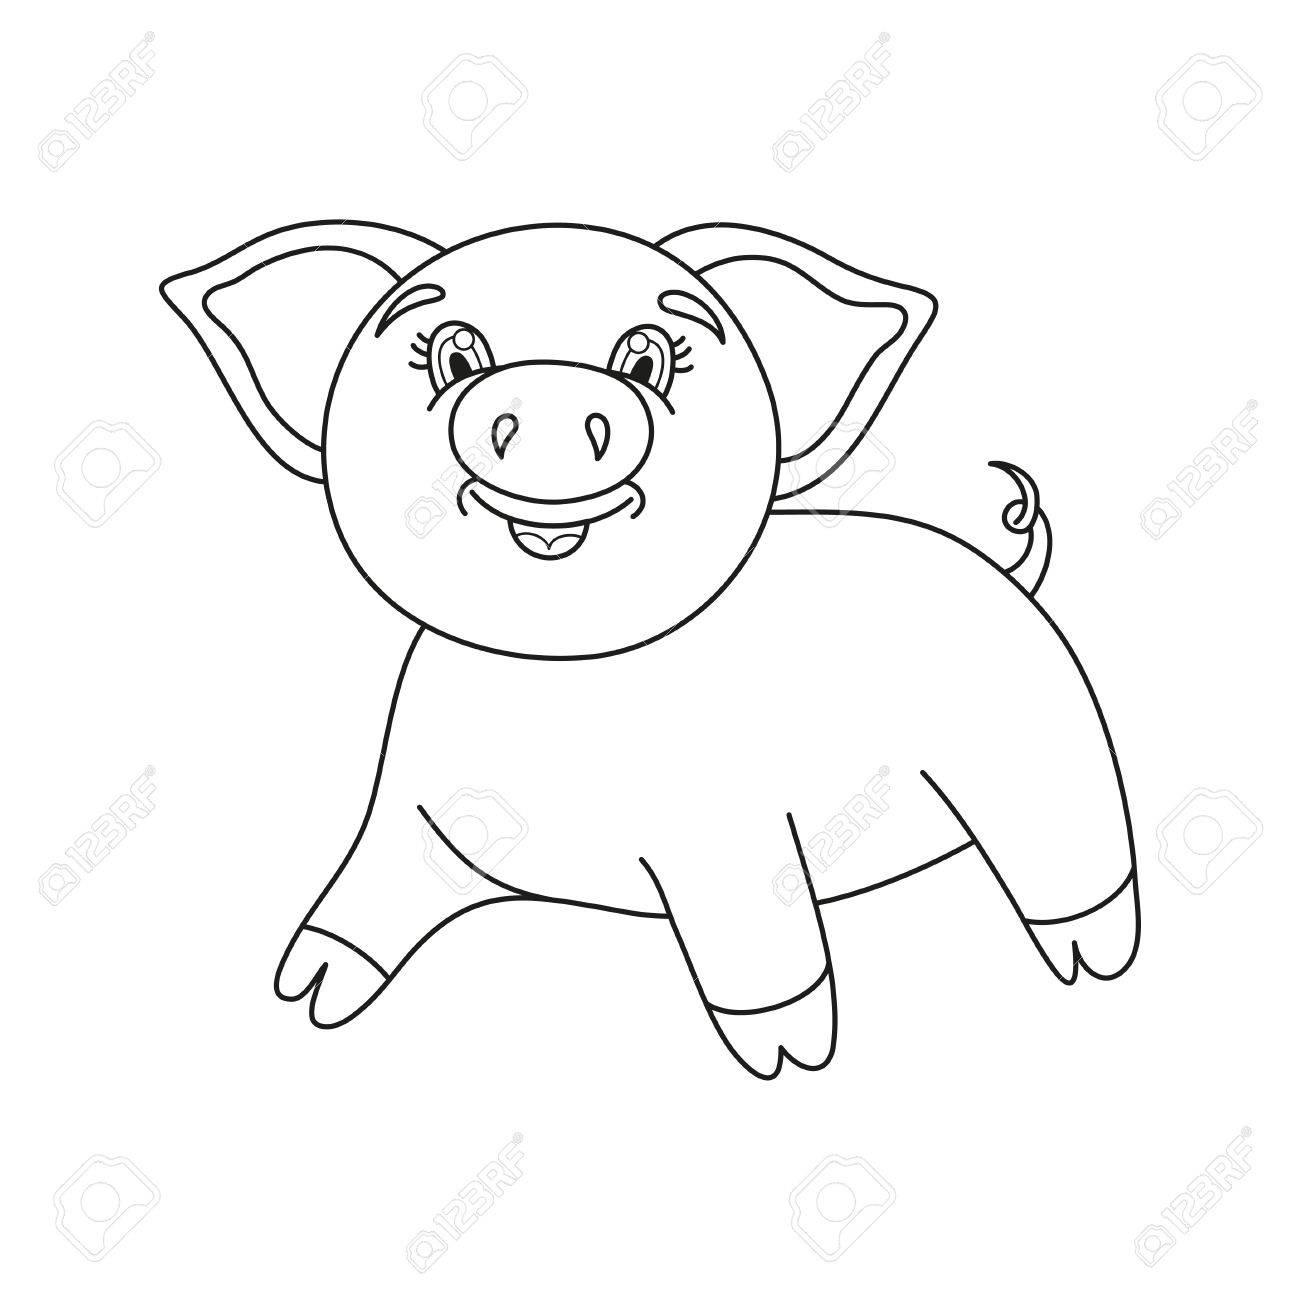 Contemporáneo Cara De Cerdo Para Colorear Motivo - Enmarcado Para ...